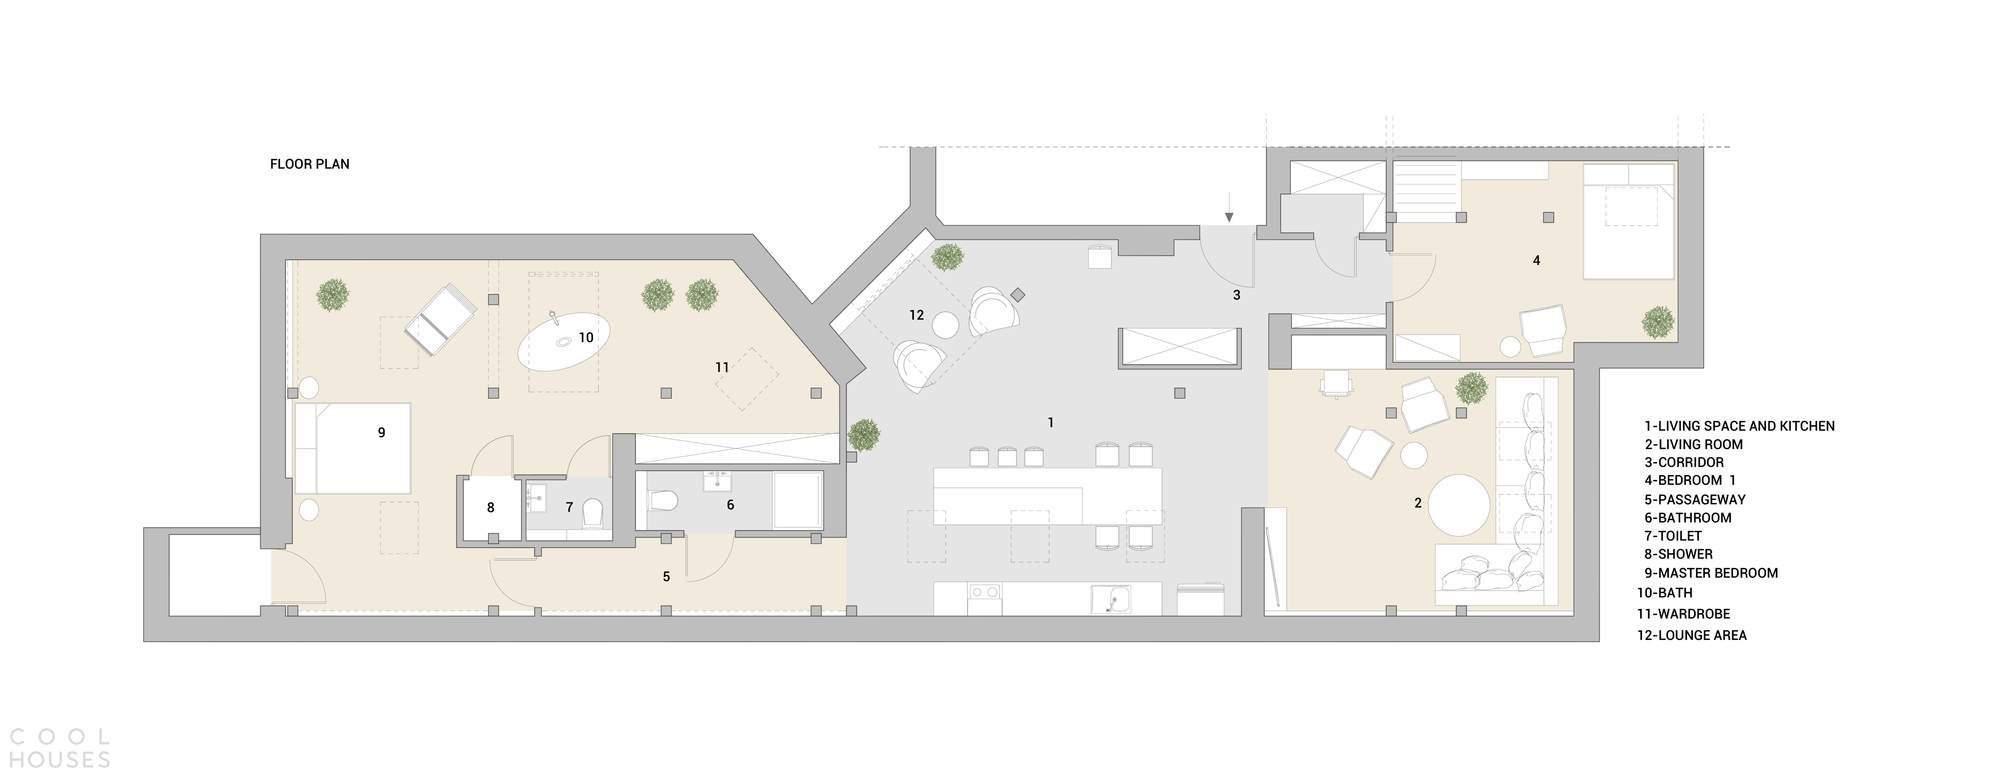 план дома 1